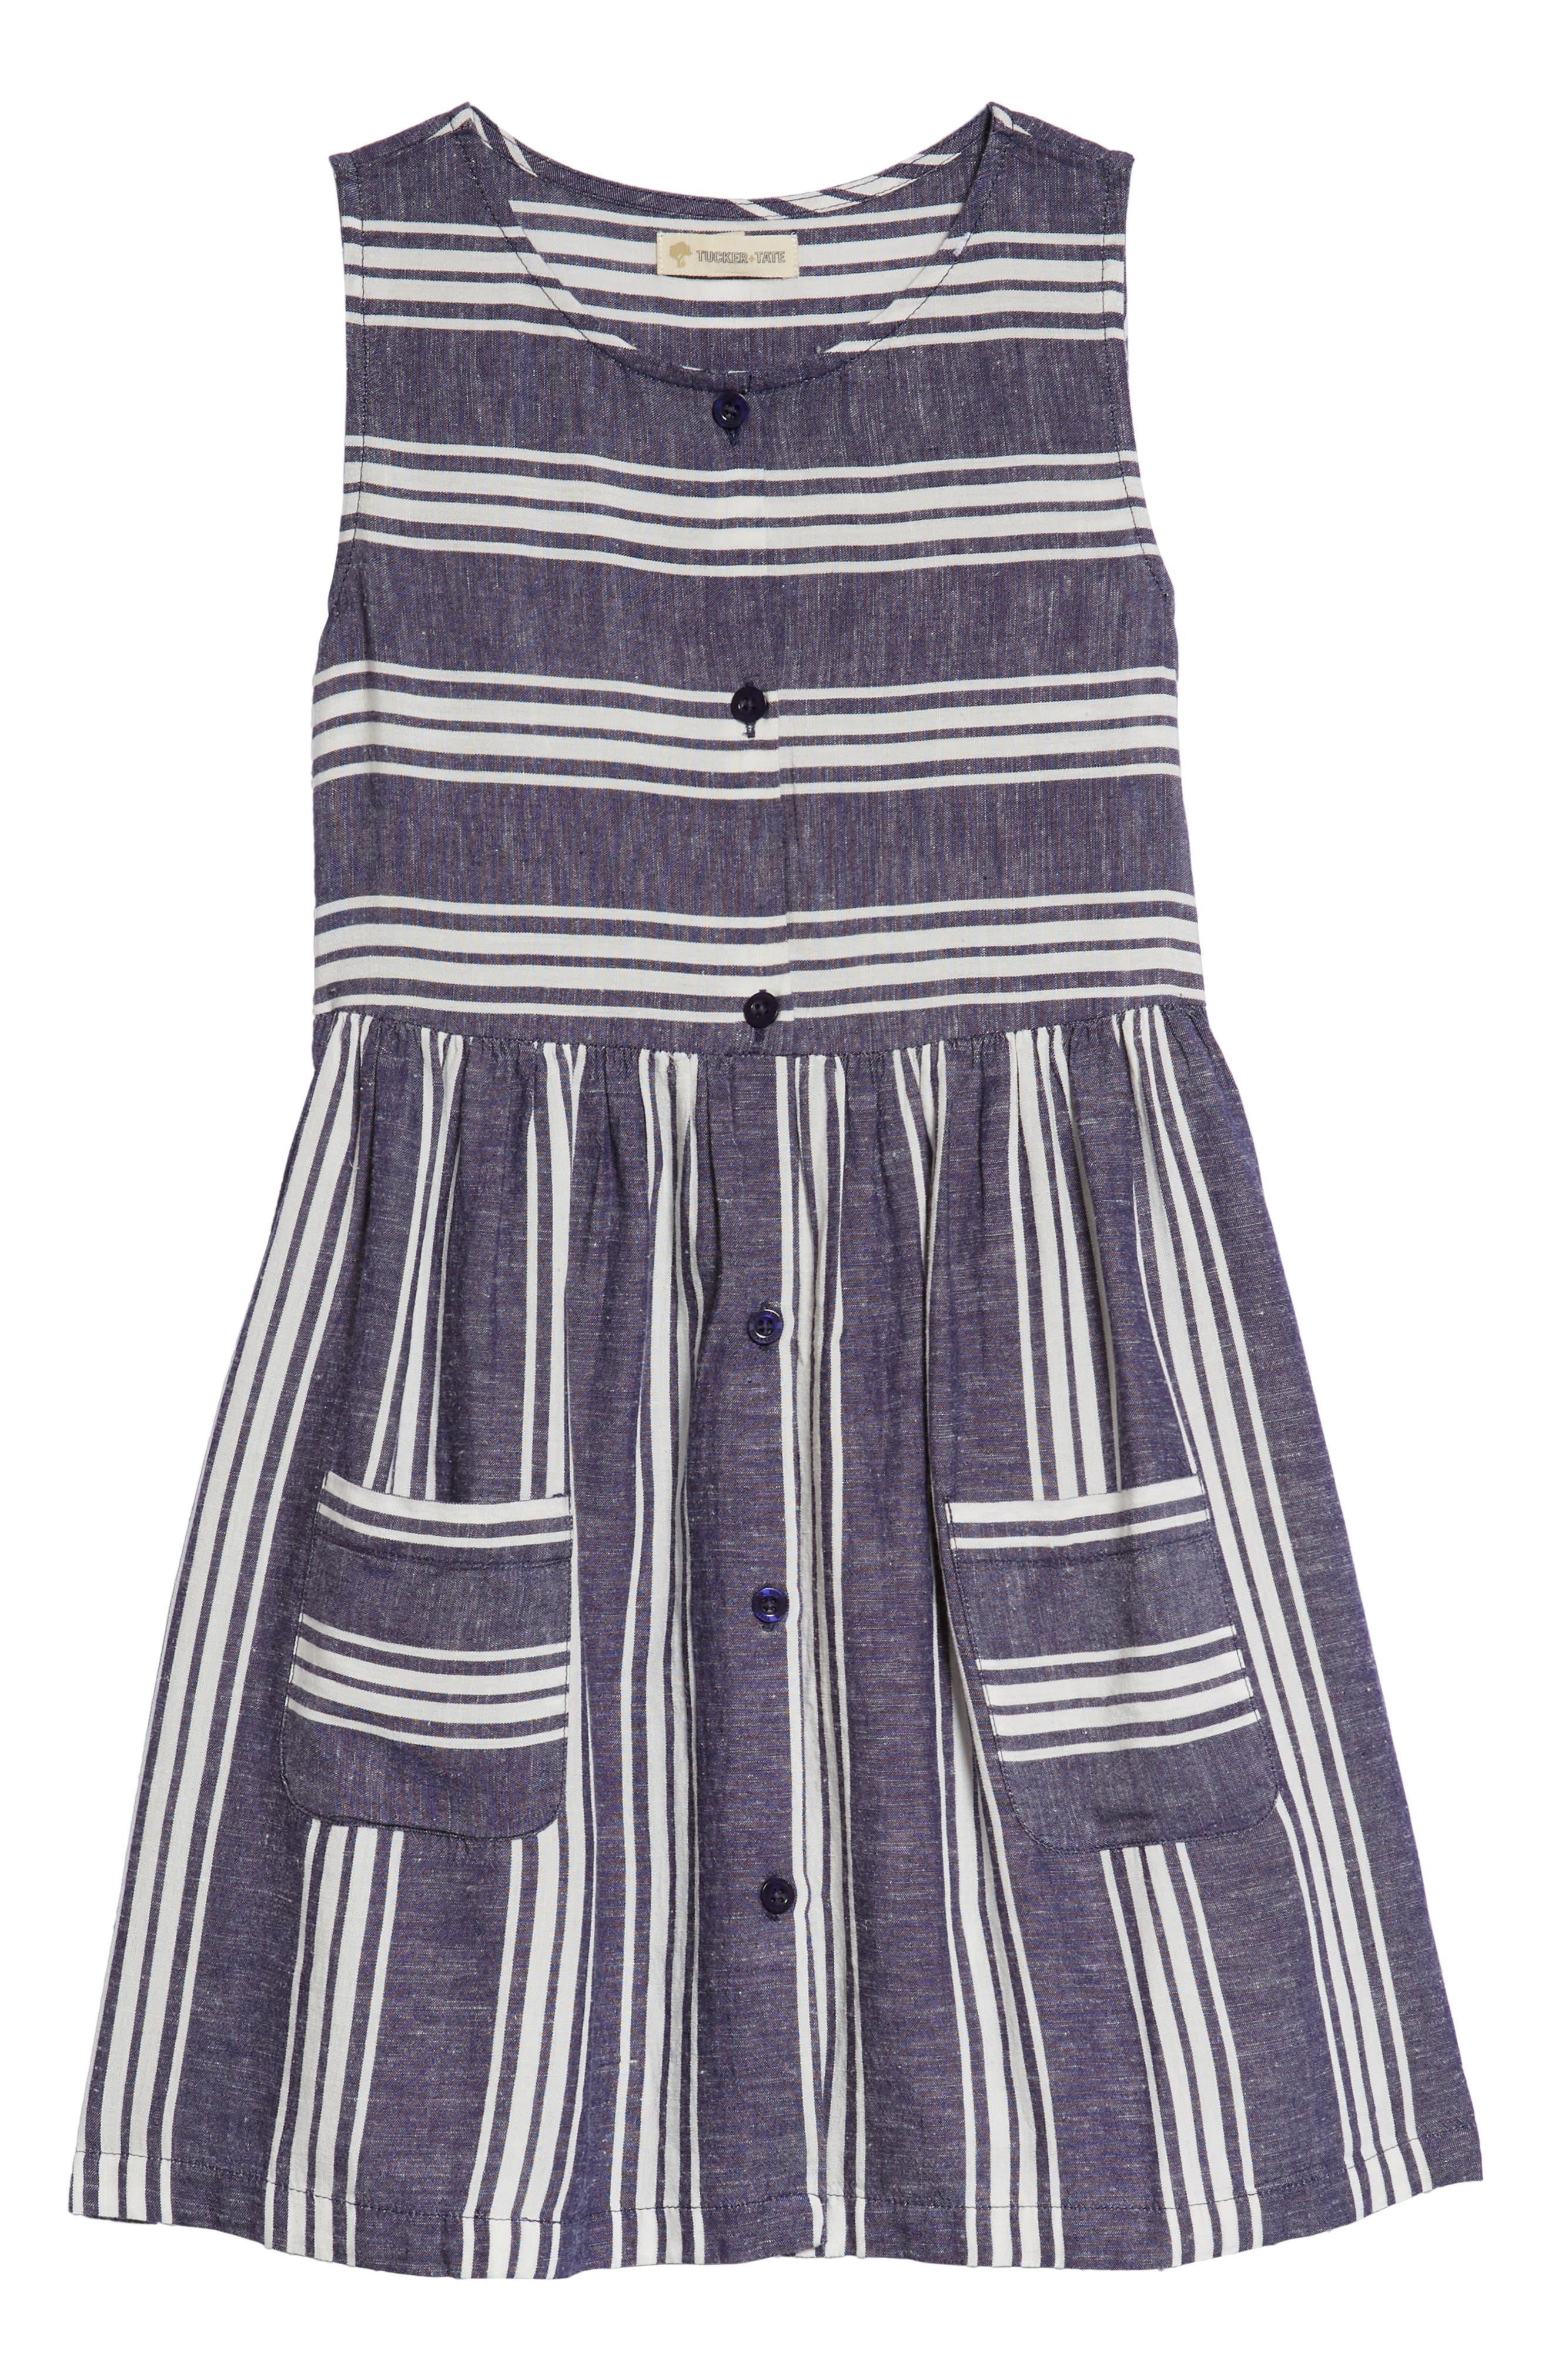 Main Image - Tucker + Tate Stripe Fit & Flare Dress (Toddler Girls, Little Girls & Big Girls)